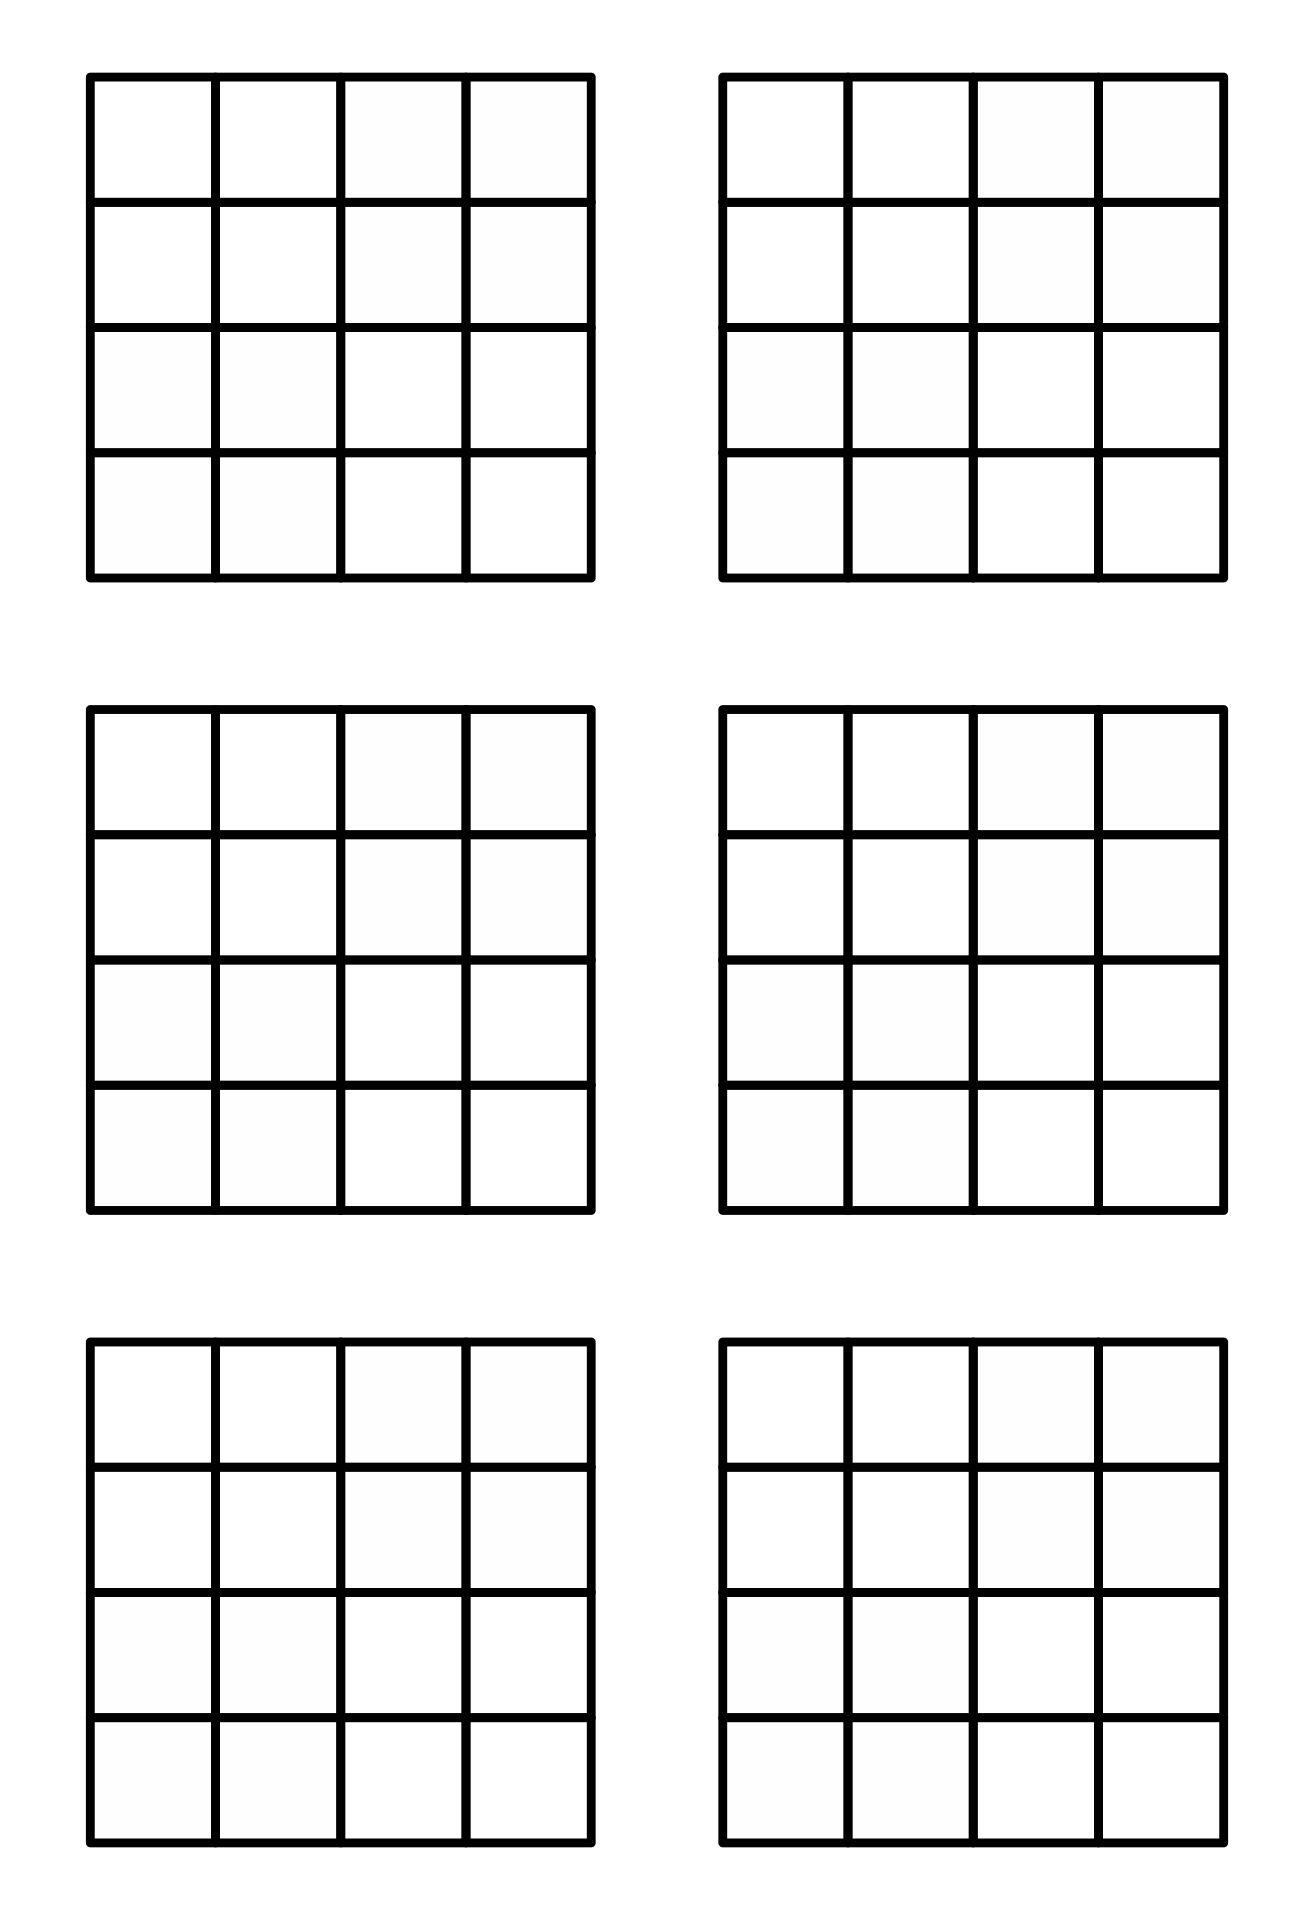 Printable Blank Sudoku Grids 6 Per Page